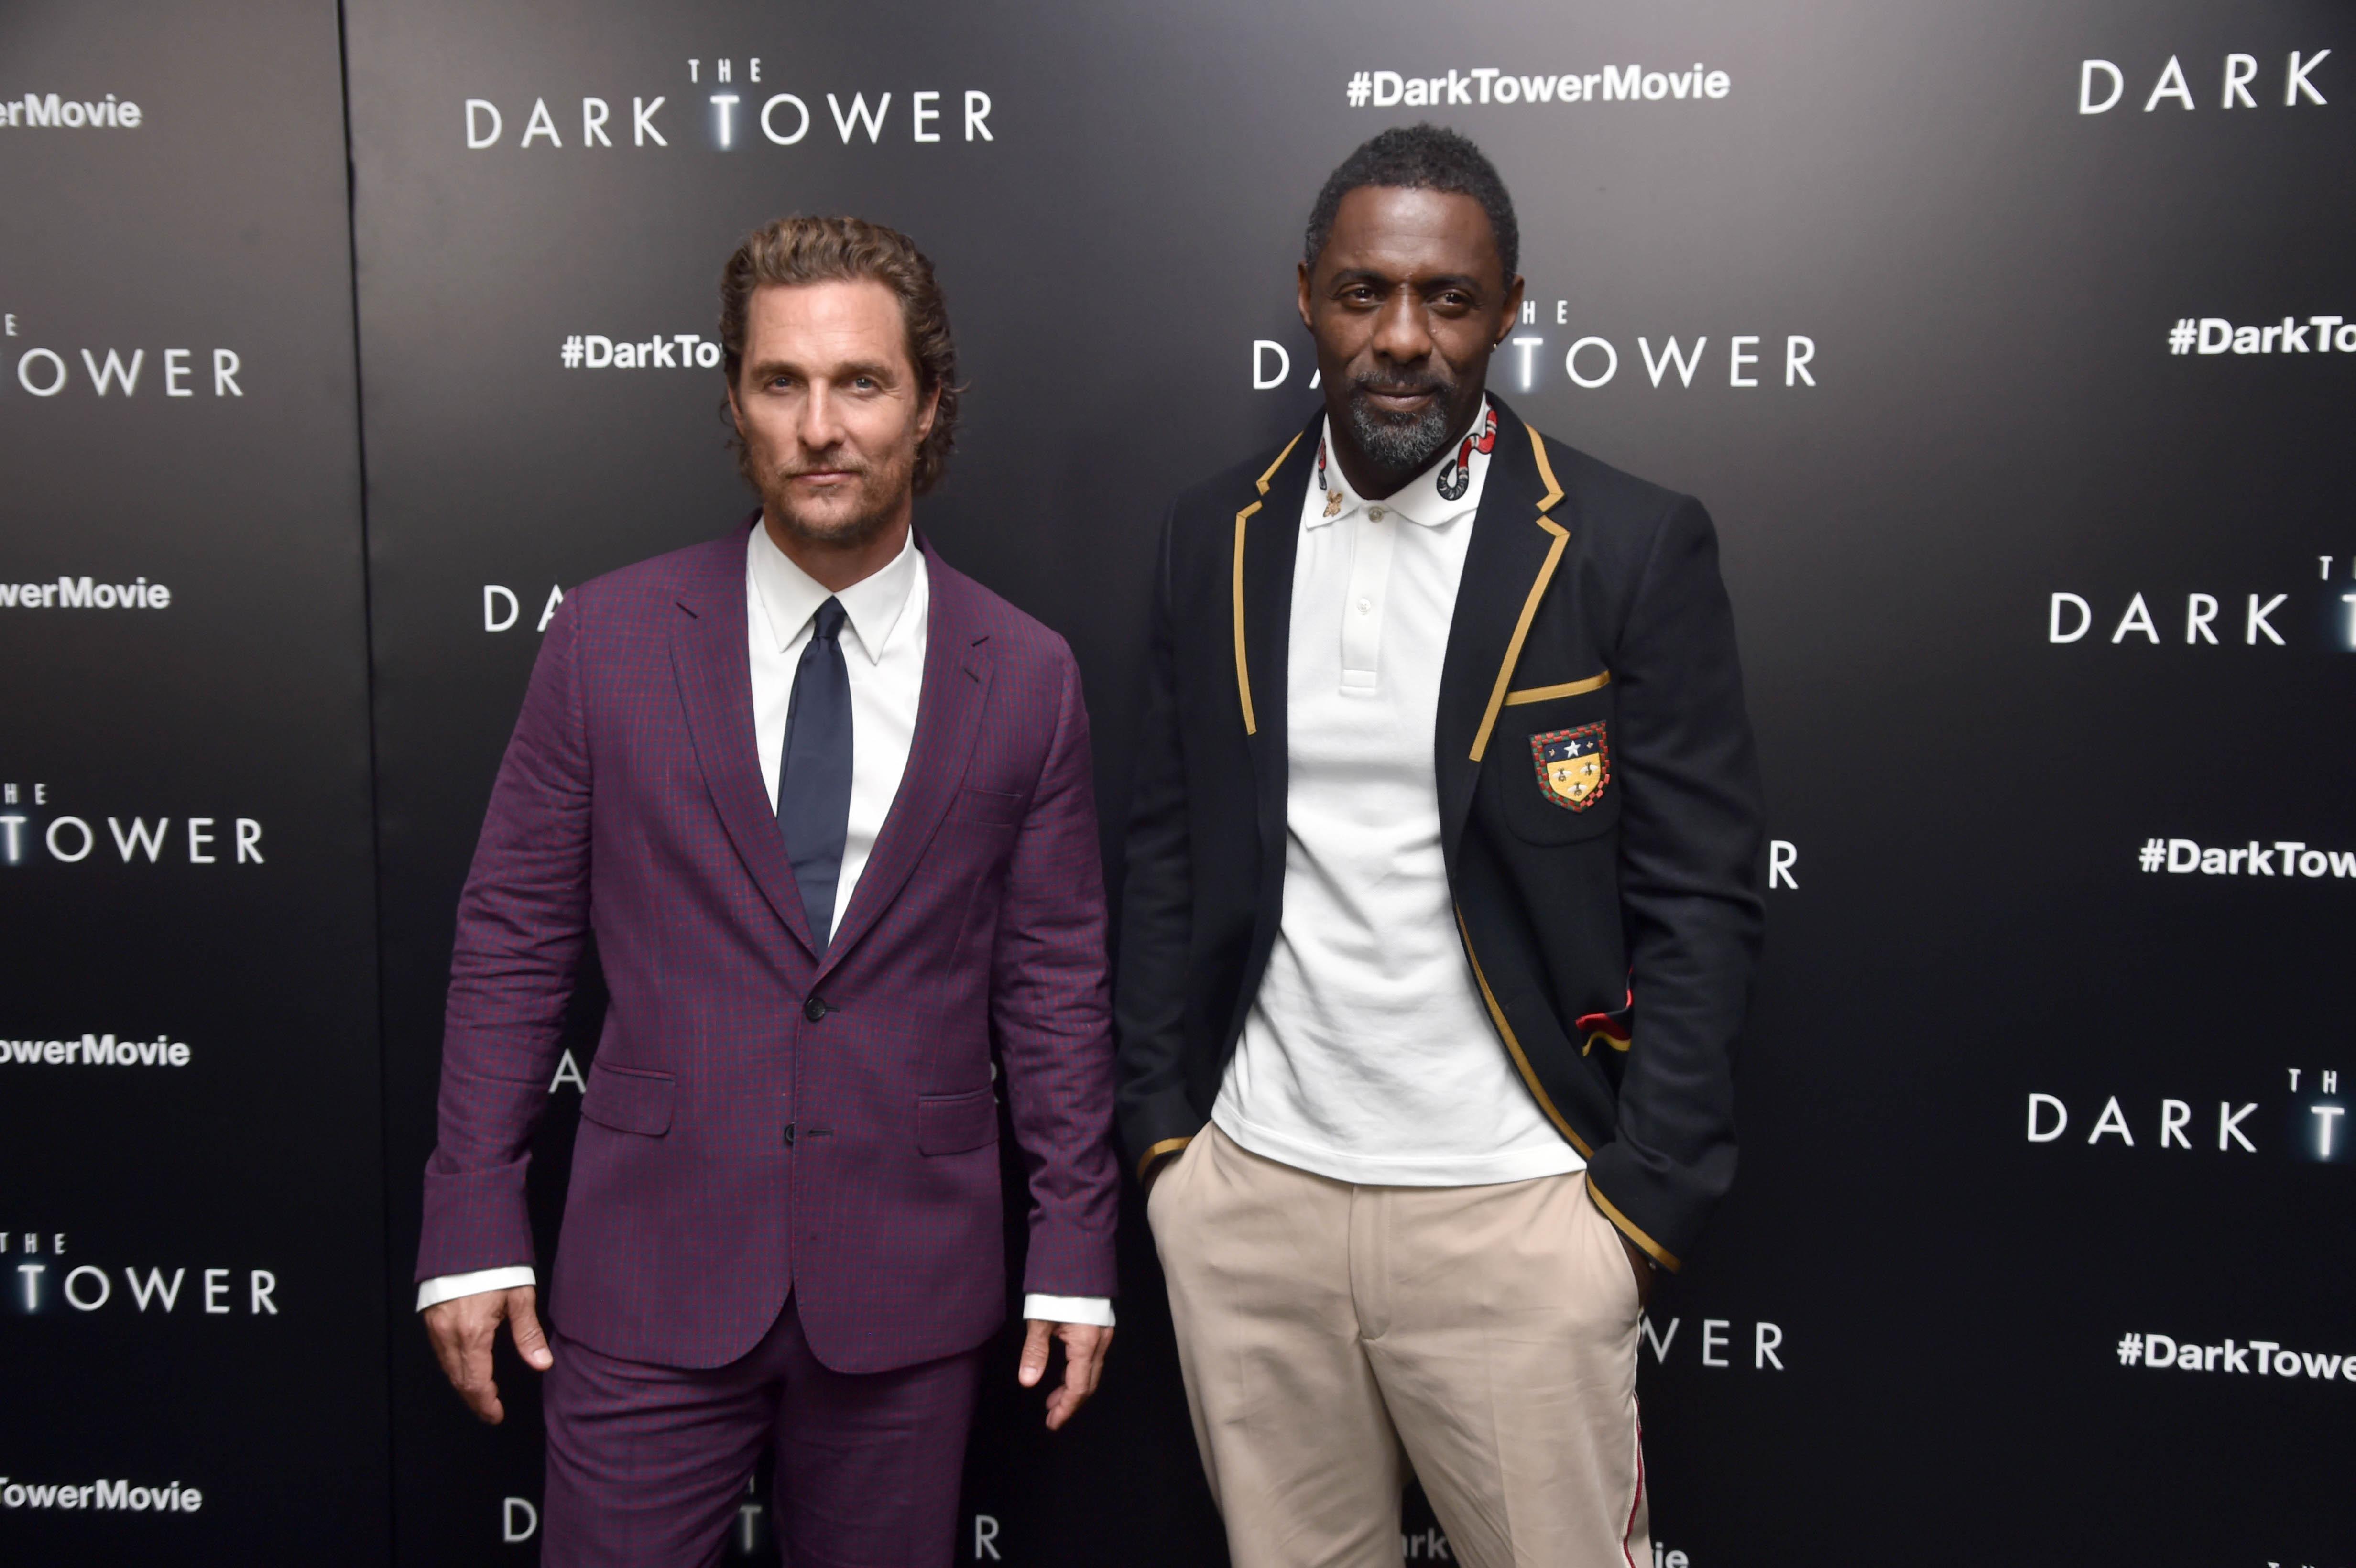 "Matthew McConaughey and Idris Elba attend ""The Dark Tower"" film premiere in New York City on July 31, 2017."